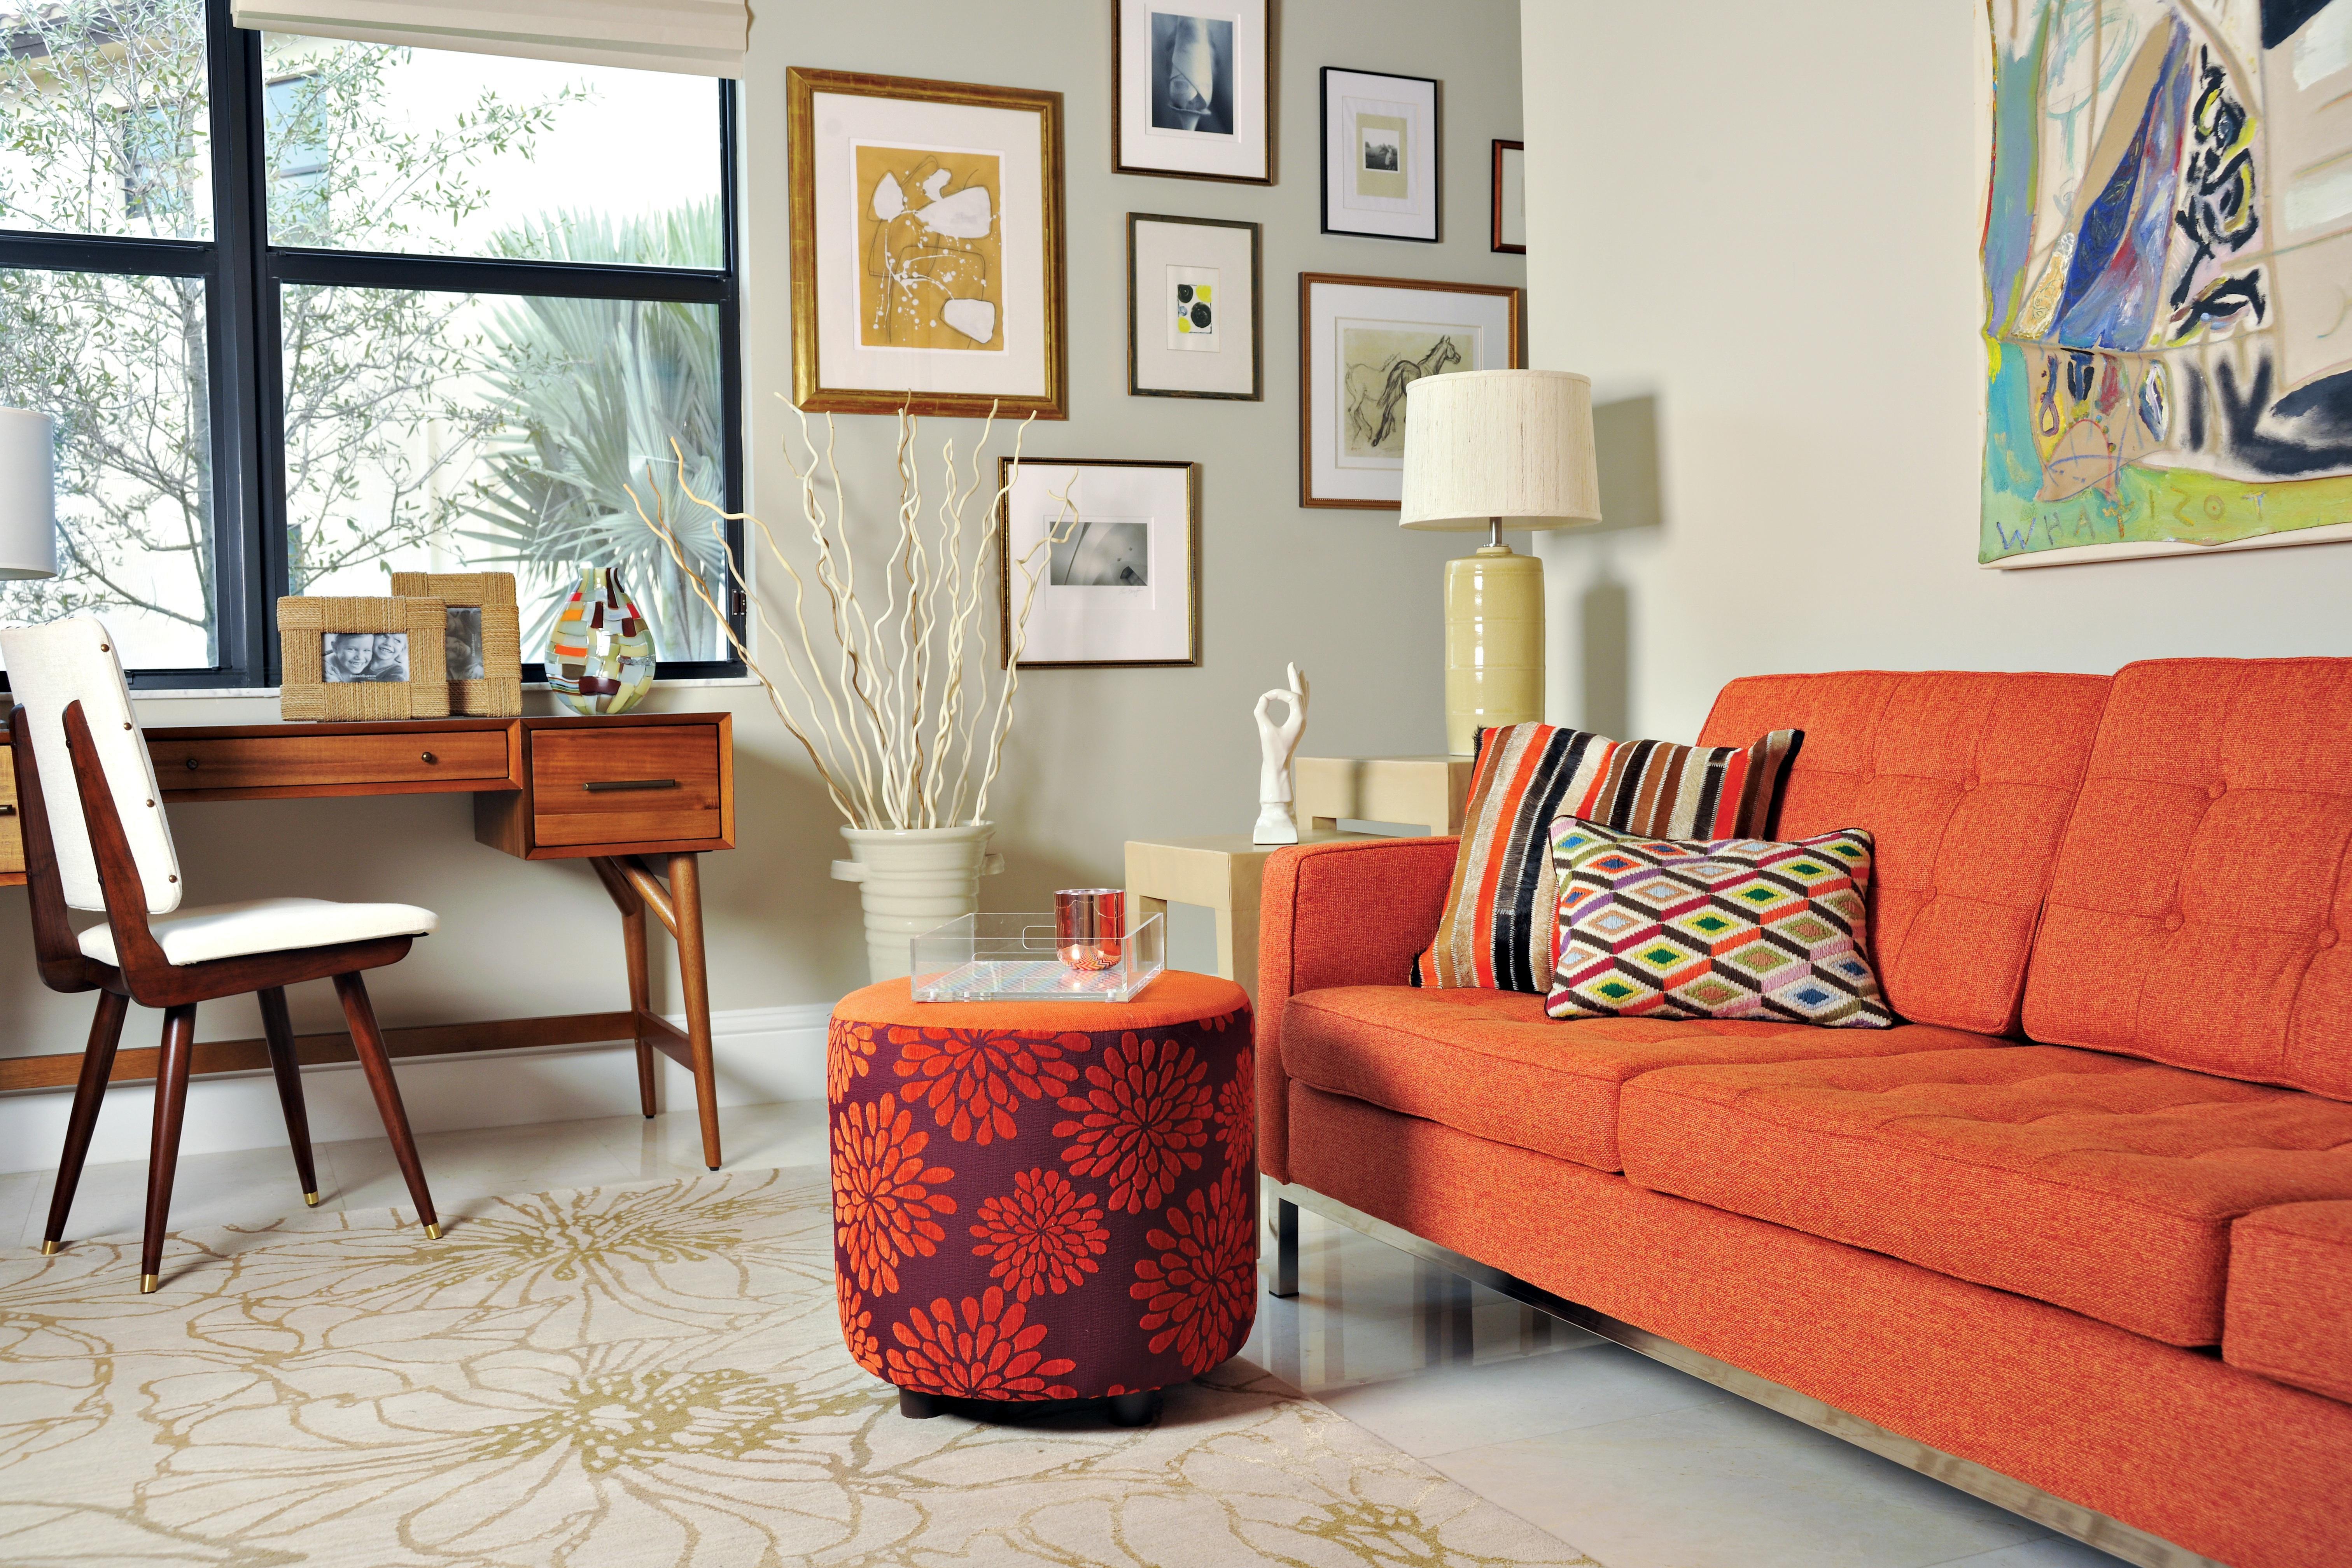 Amazing Lisa.michael.interiors.portfolio.interiors.home.office.1501110143.044207